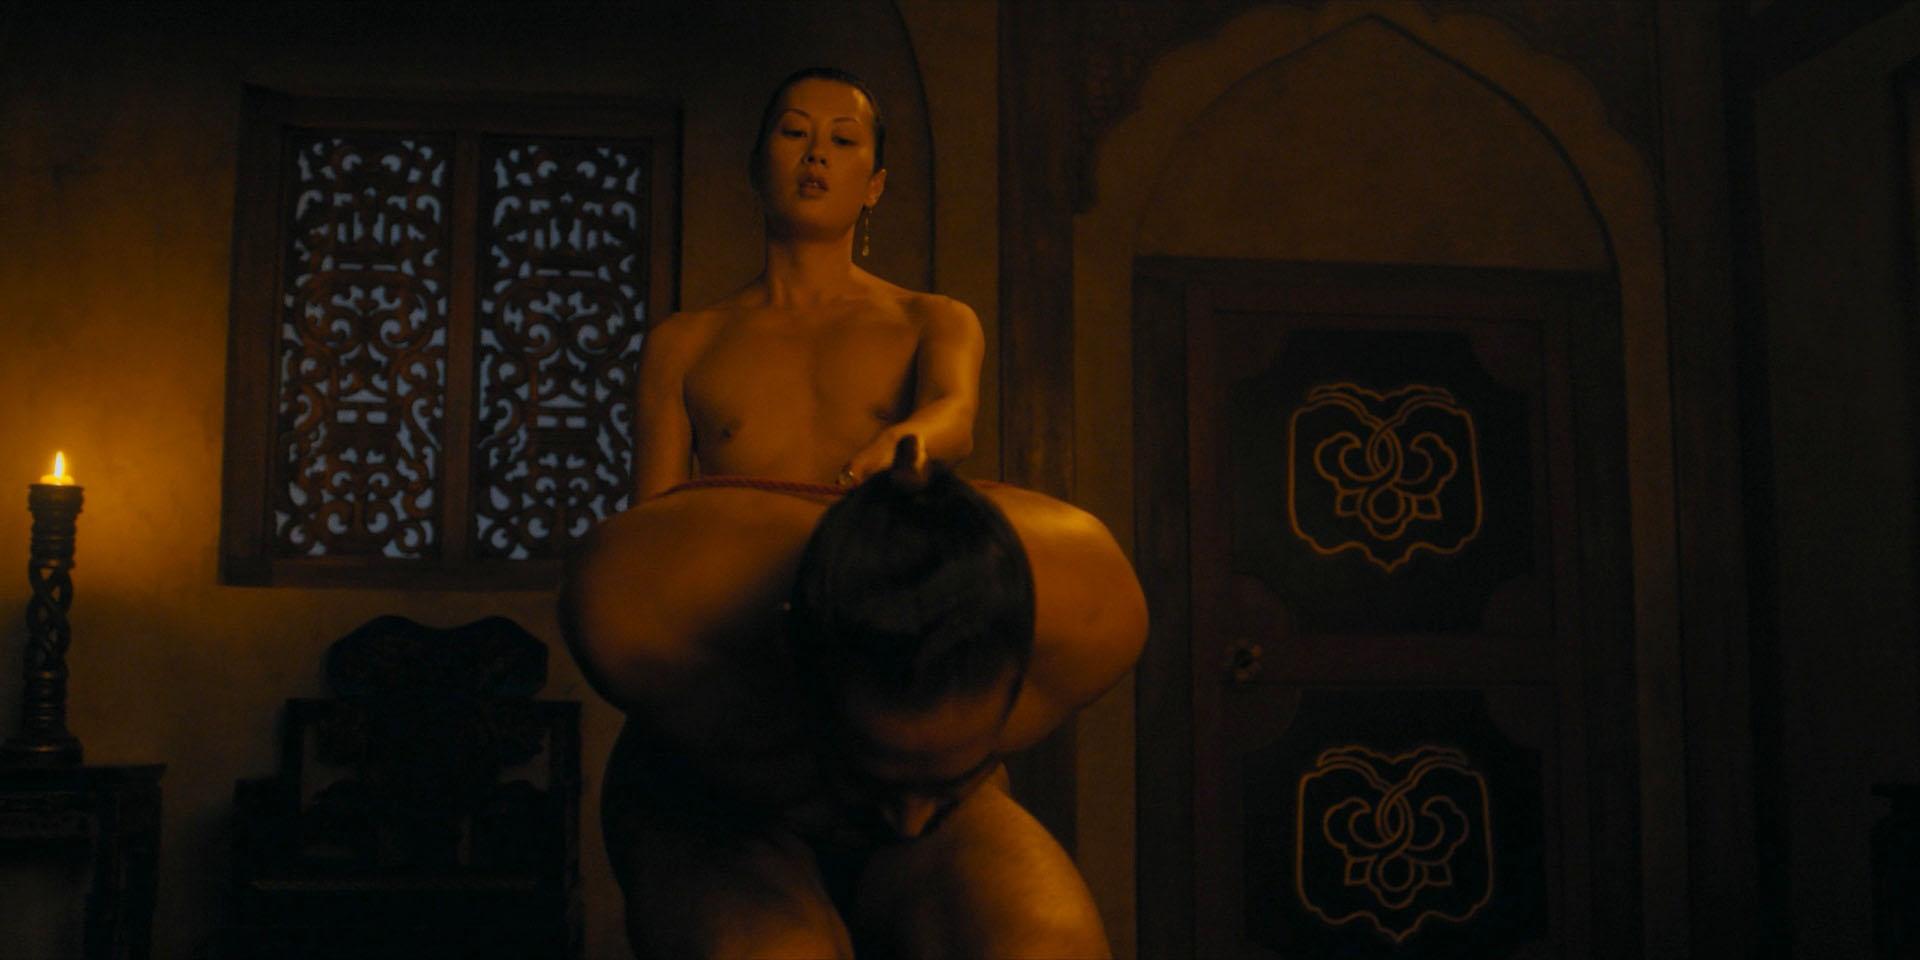 A free vidio of a young girl sucking cock